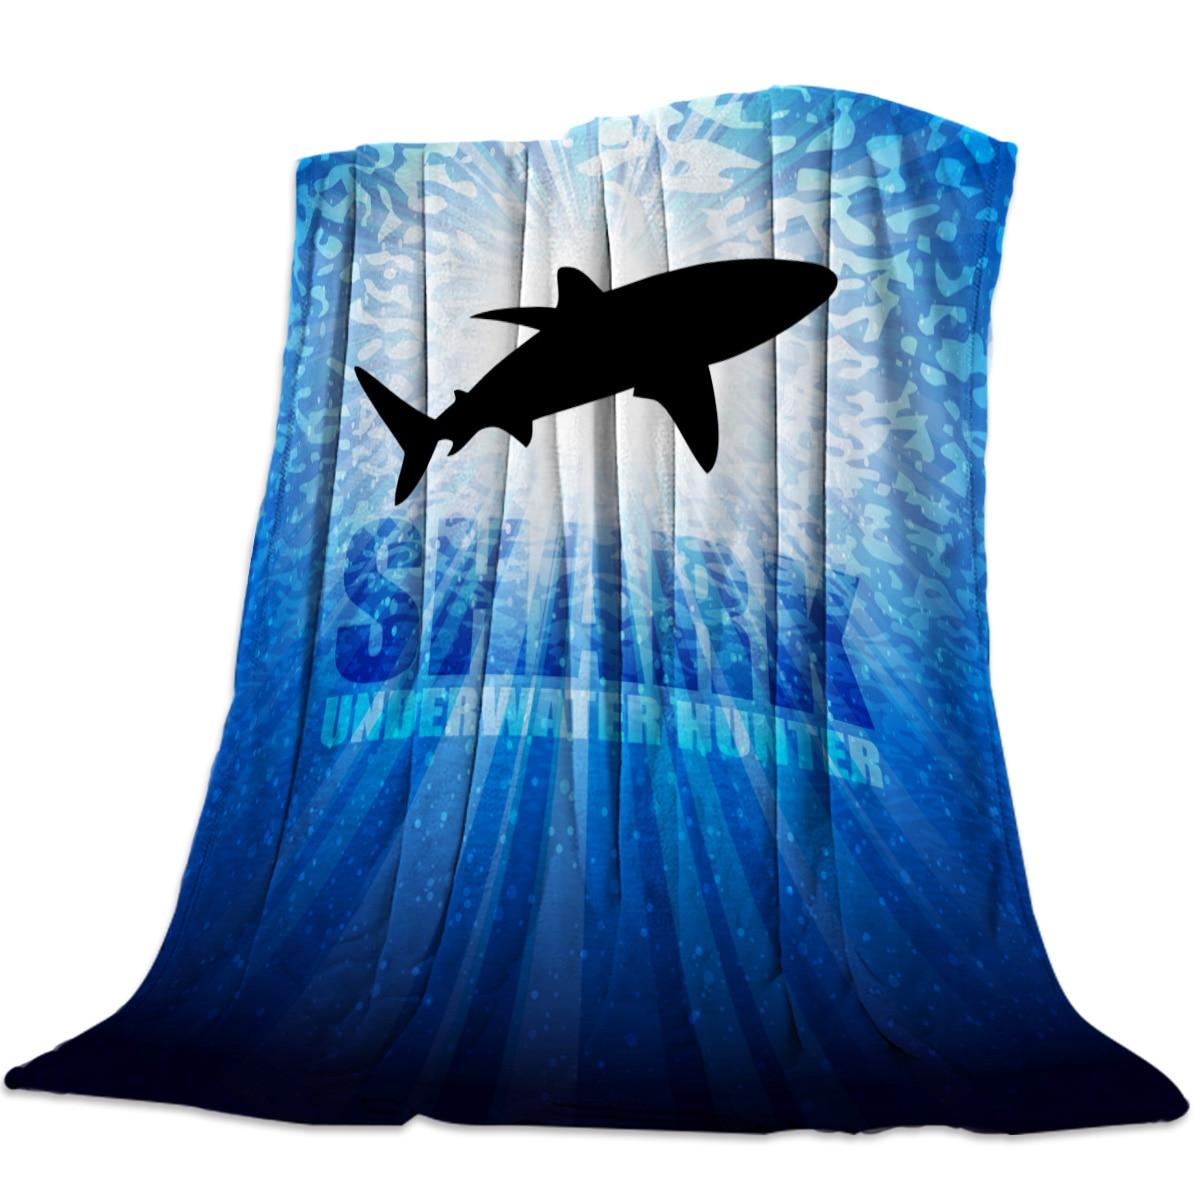 Manta de franela Shark Silhouette Deep Sea para cama sofá portátil suave manta de felpa divertida